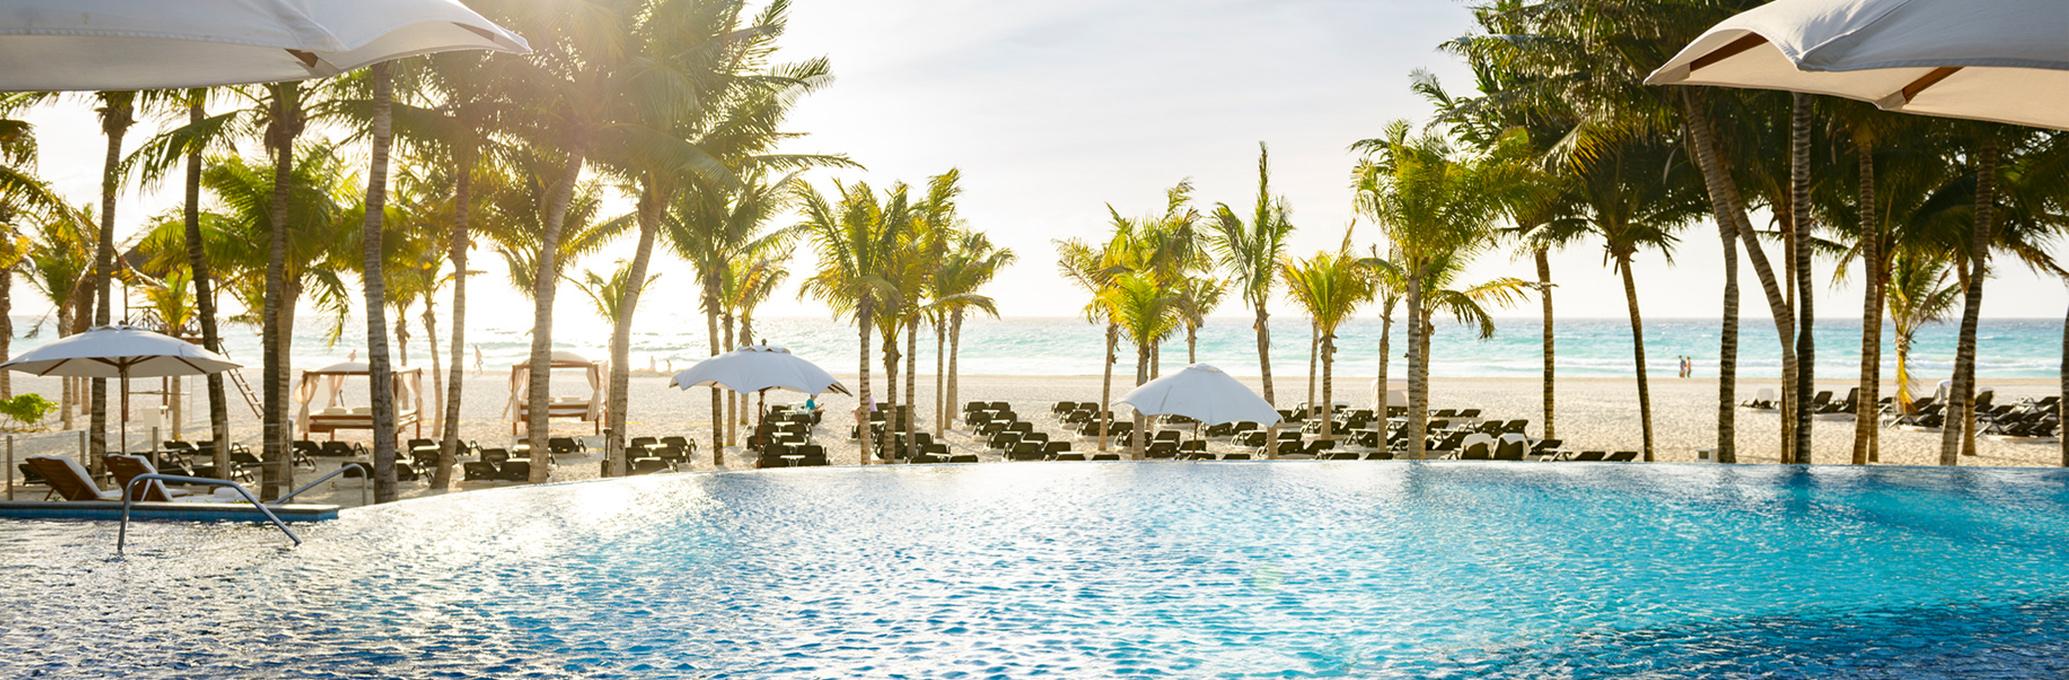 Royal Hideaway Playacar: hoteles en playa del Carmen de lujo